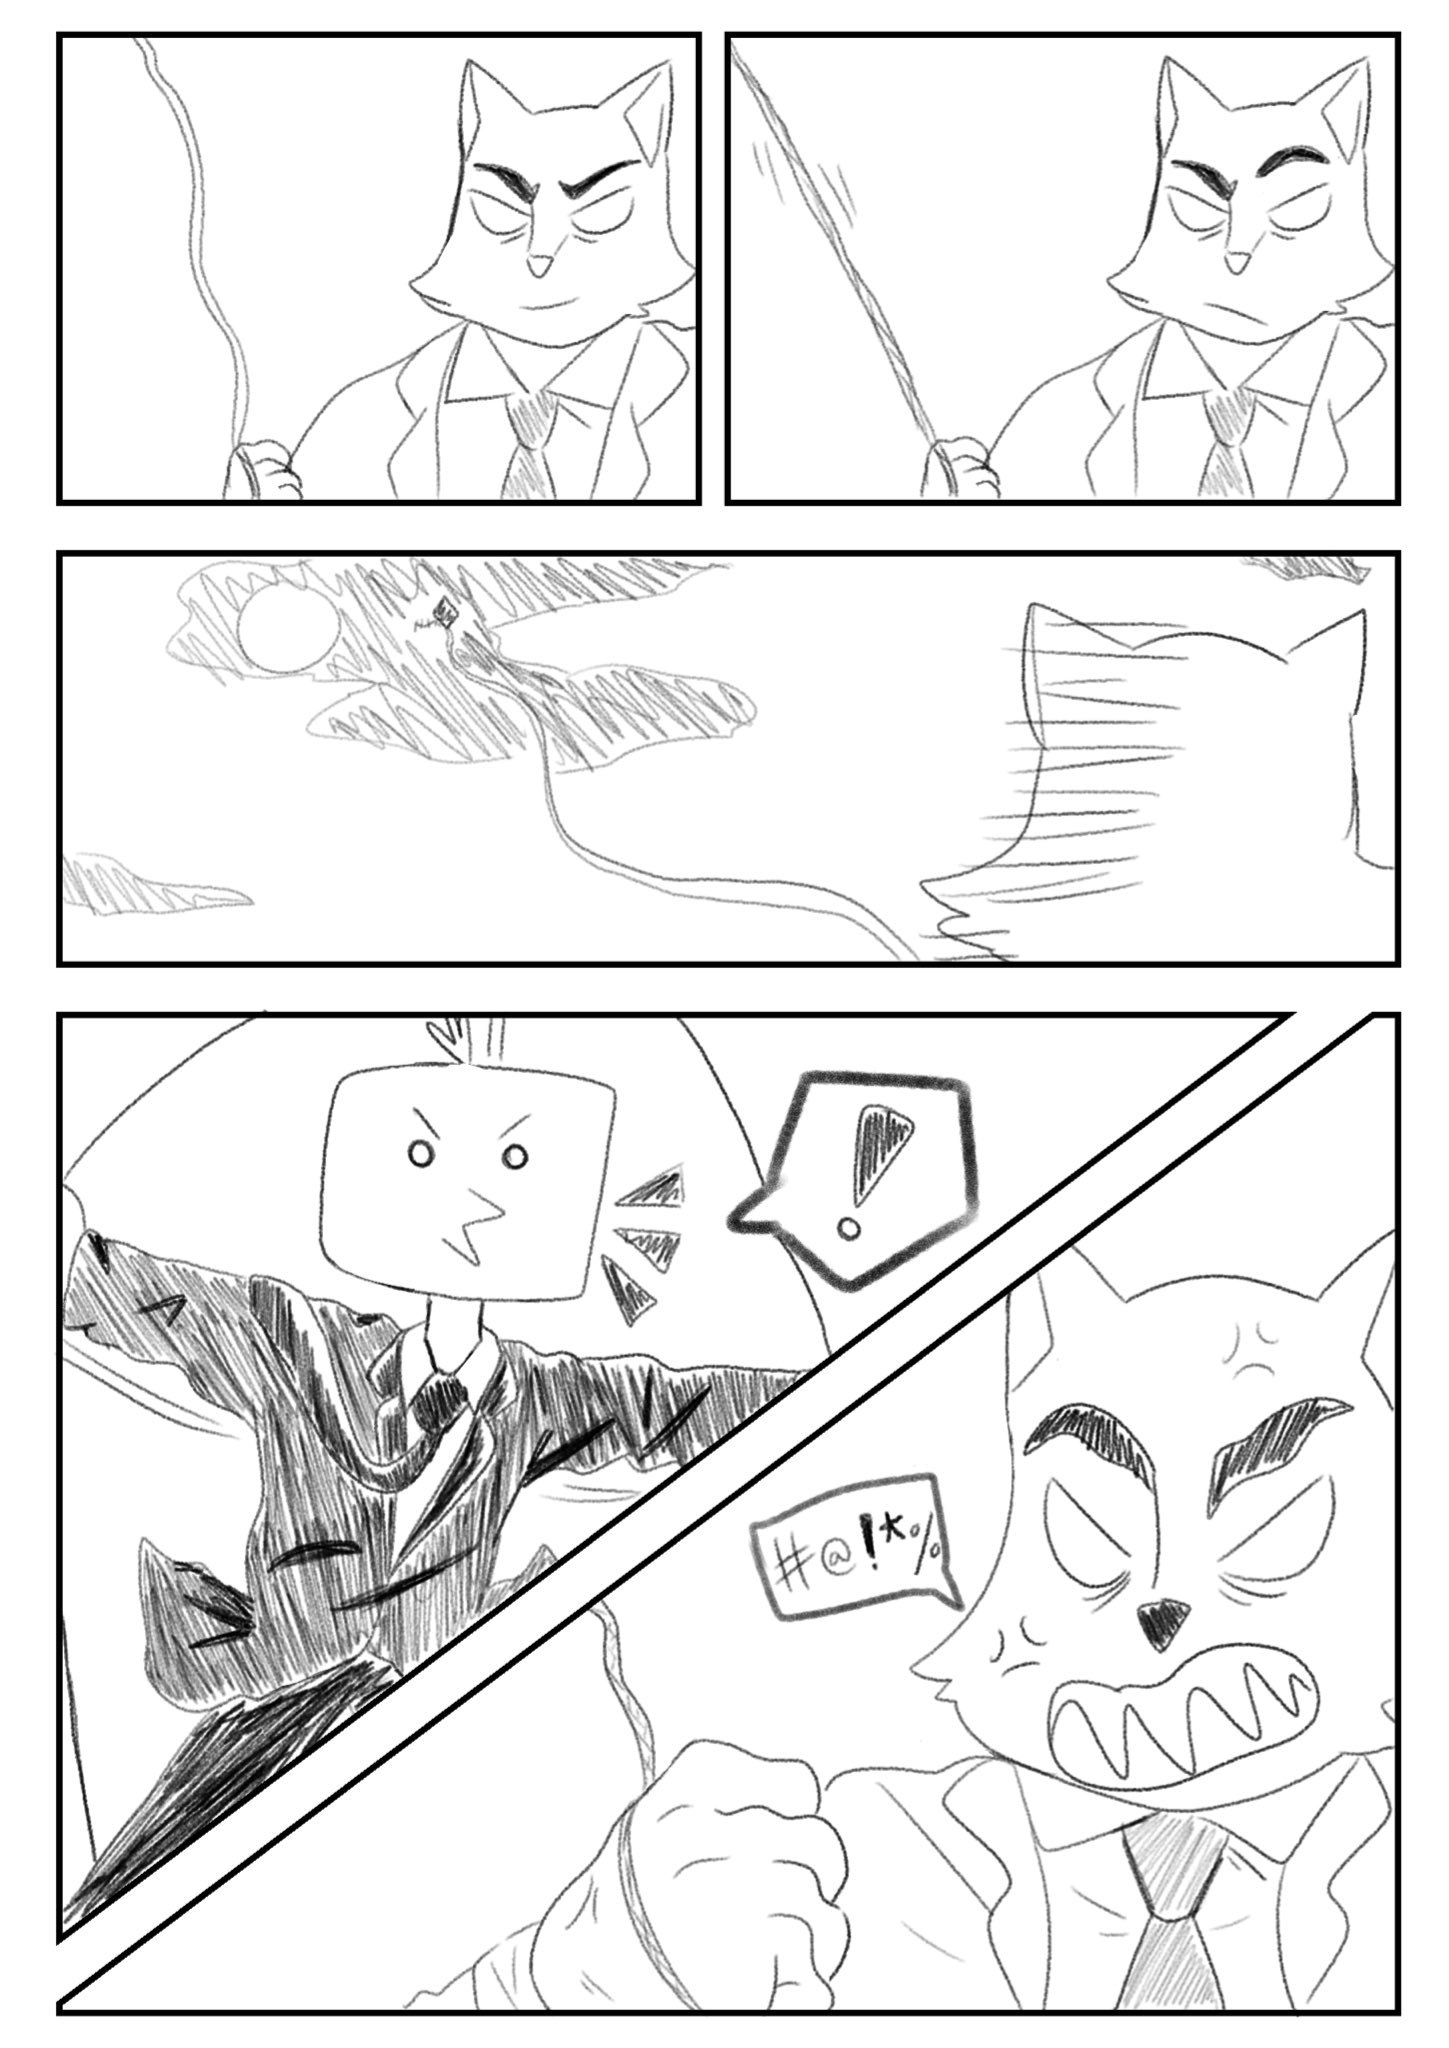 Copy of Agent Bird Fan comic by @OslekHarbour